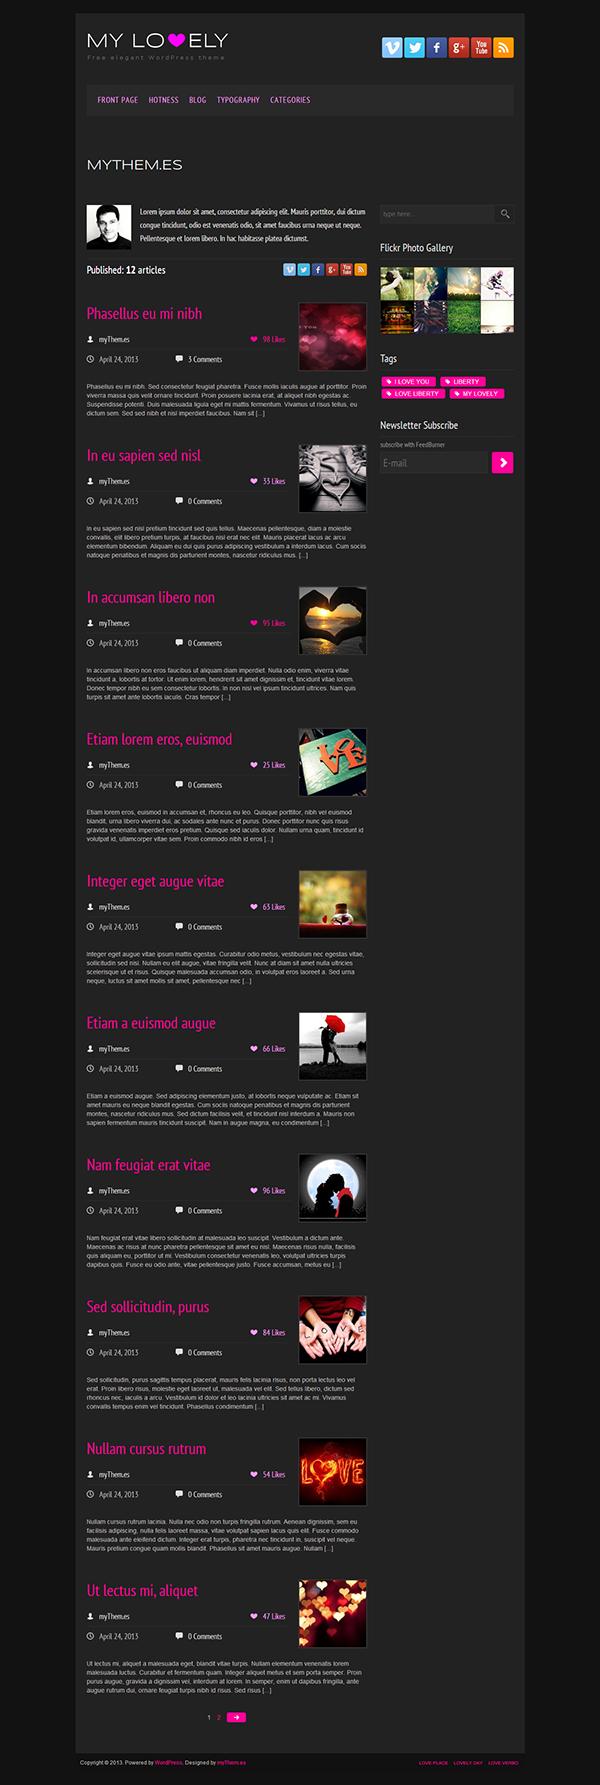 black custom features dark theme elegant Theme Free Template free wordpress theme heart Internal Likes Lovely Theme minimalist Pink Purple wordpress wordpress theme